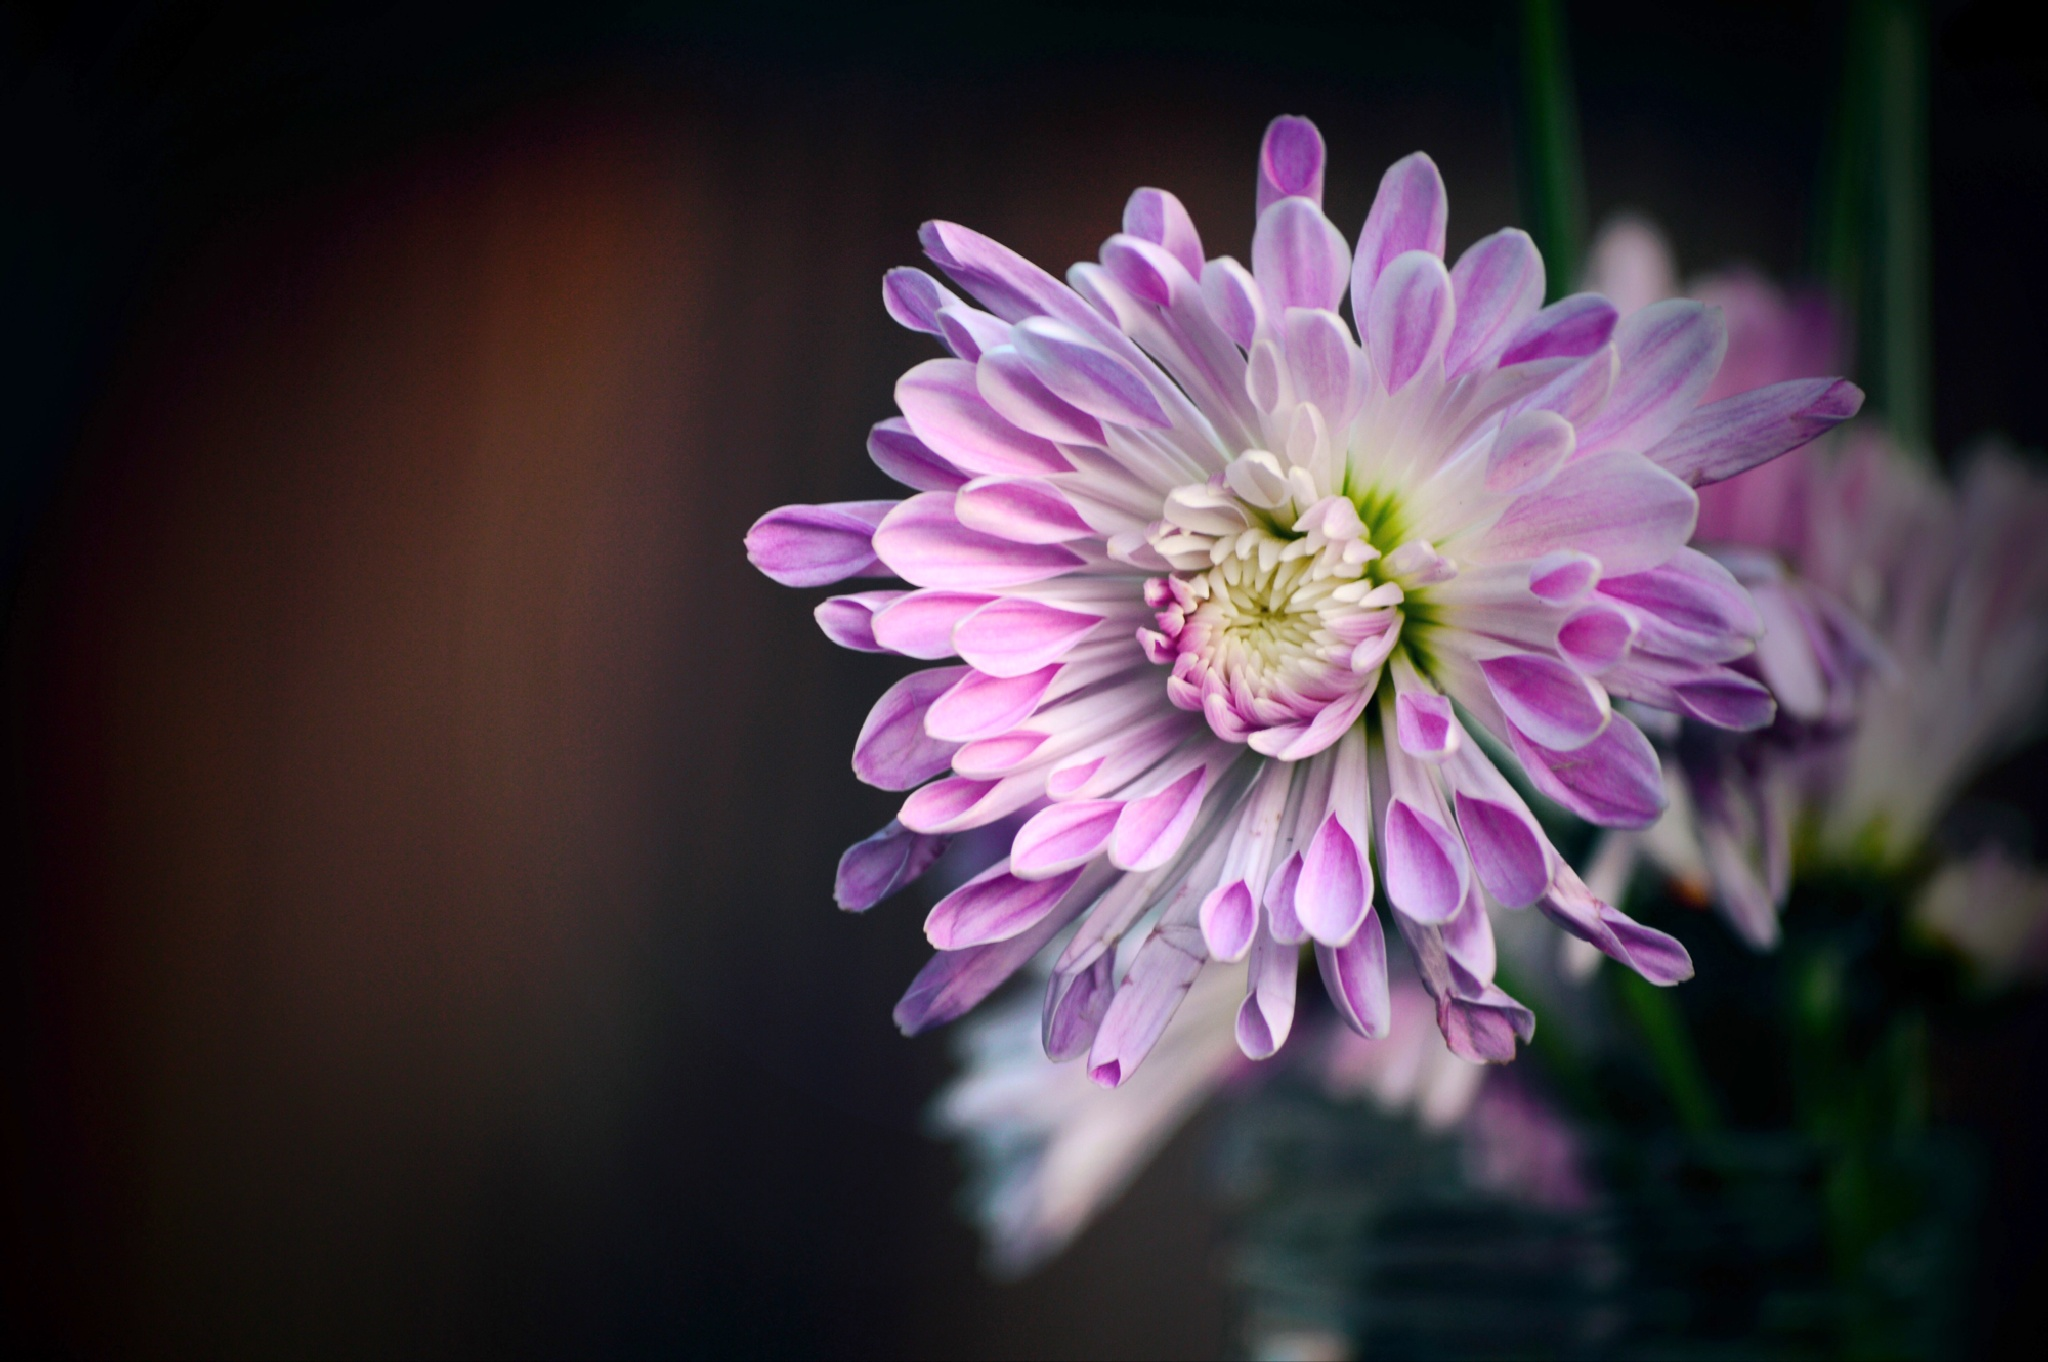 Purple Flower by Janet Dalton Photography